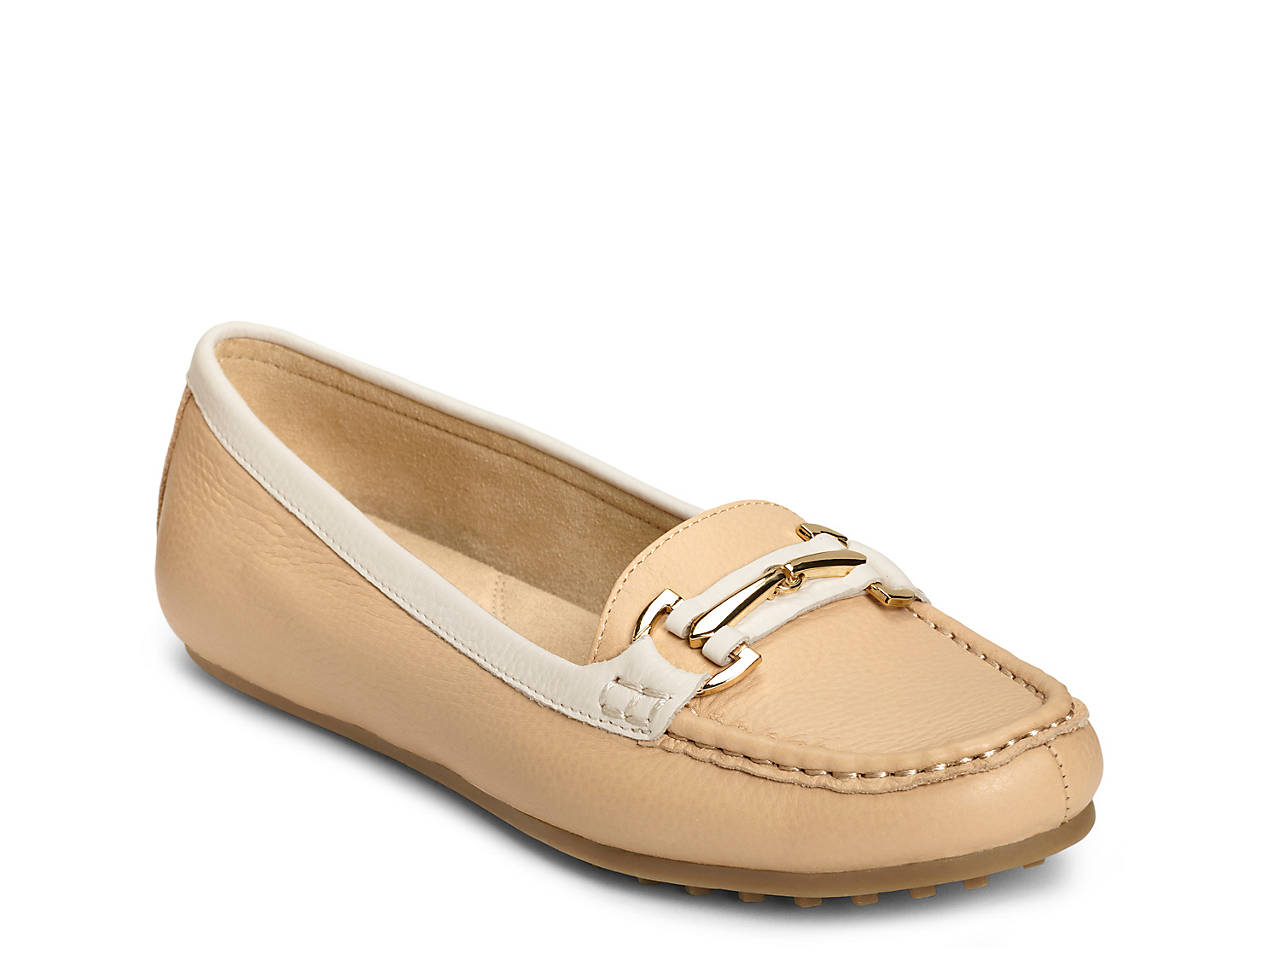 e79bb8974d Aerosoles Drive Along Loafer Women s Shoes